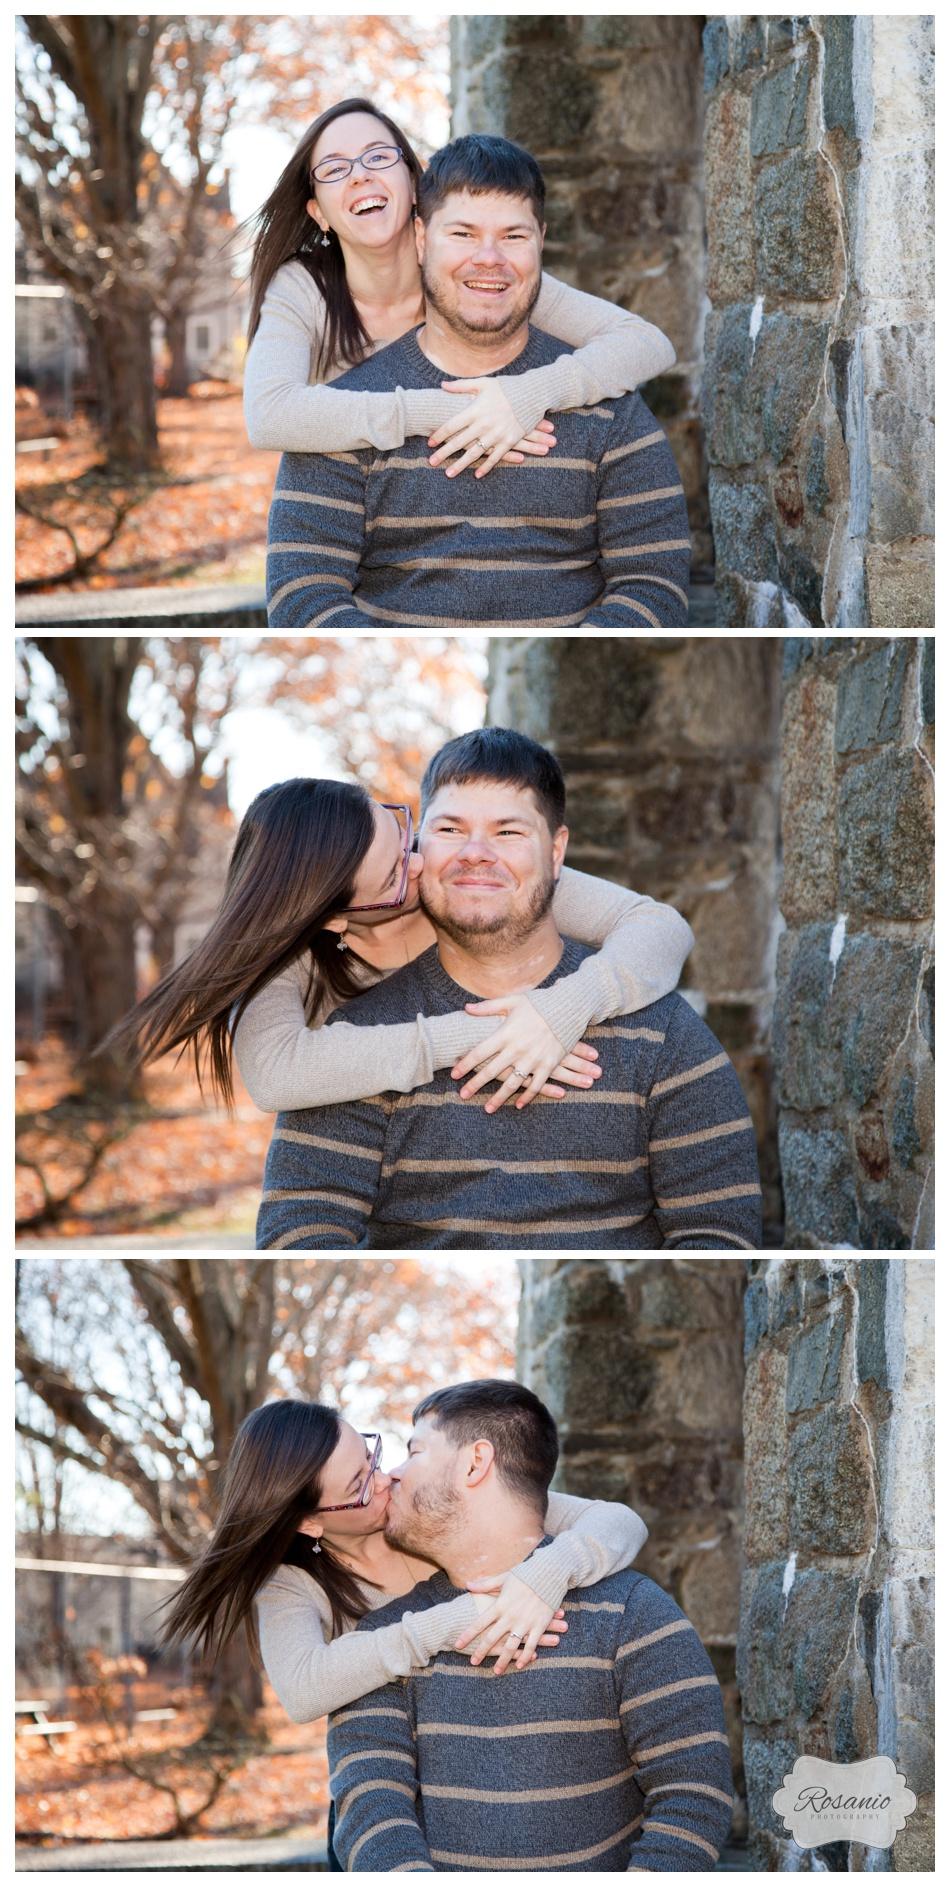 Rosanio Photography | Atkinson Common, Newburyport MA | Massachusetts Engagement Photographer_0003.jpg